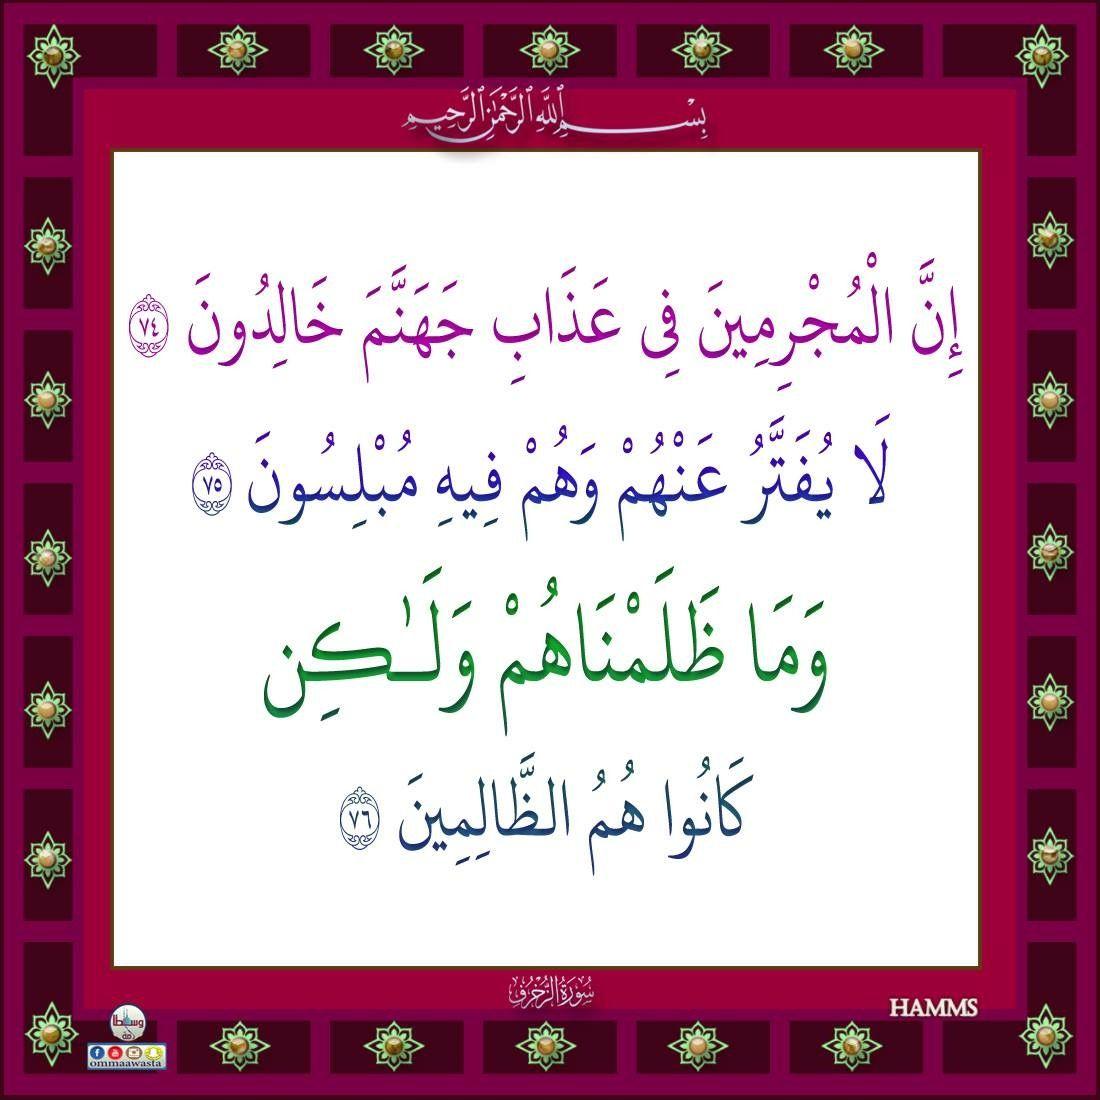 ٧٤ ٧٦ الزخرف Arabic Calligraphy Calligraphy